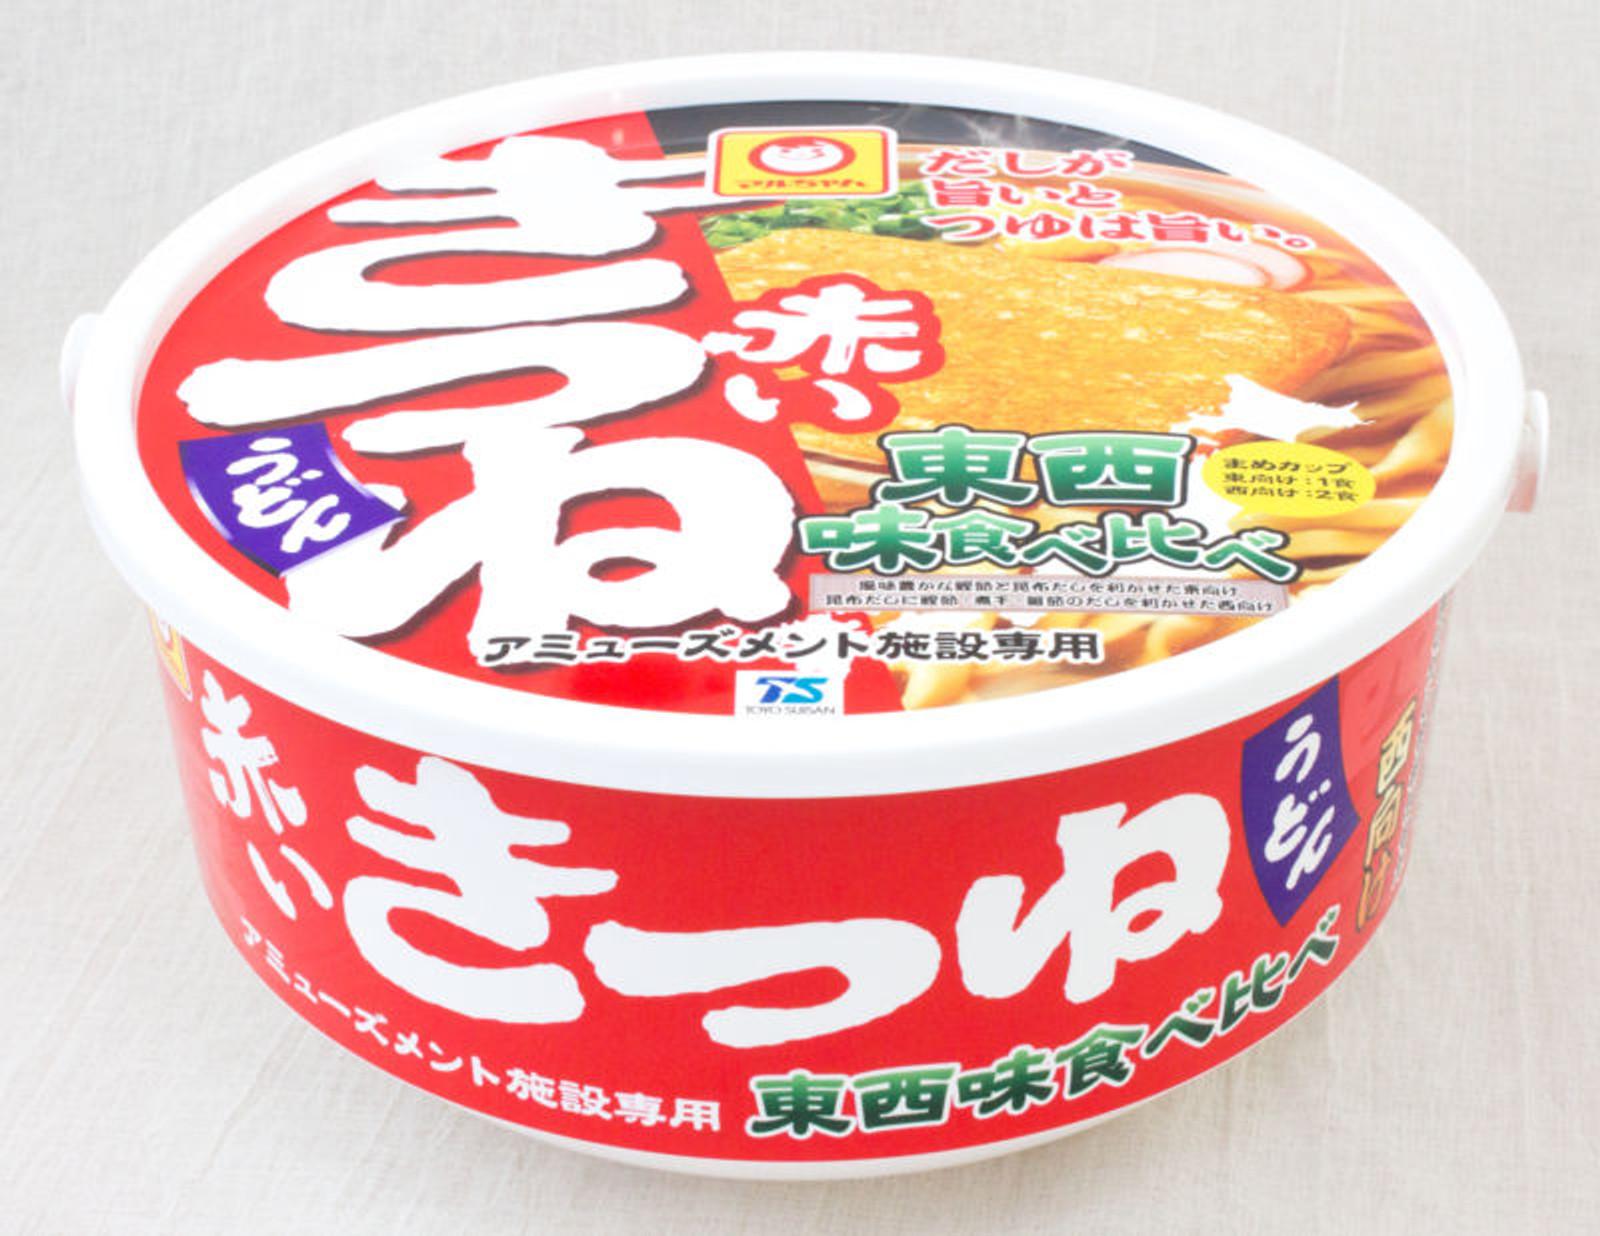 Akai Kitsune Cup Noodles Type Multi Case Box Maru-Chan Toyo Suisan JAPAN INSTANT